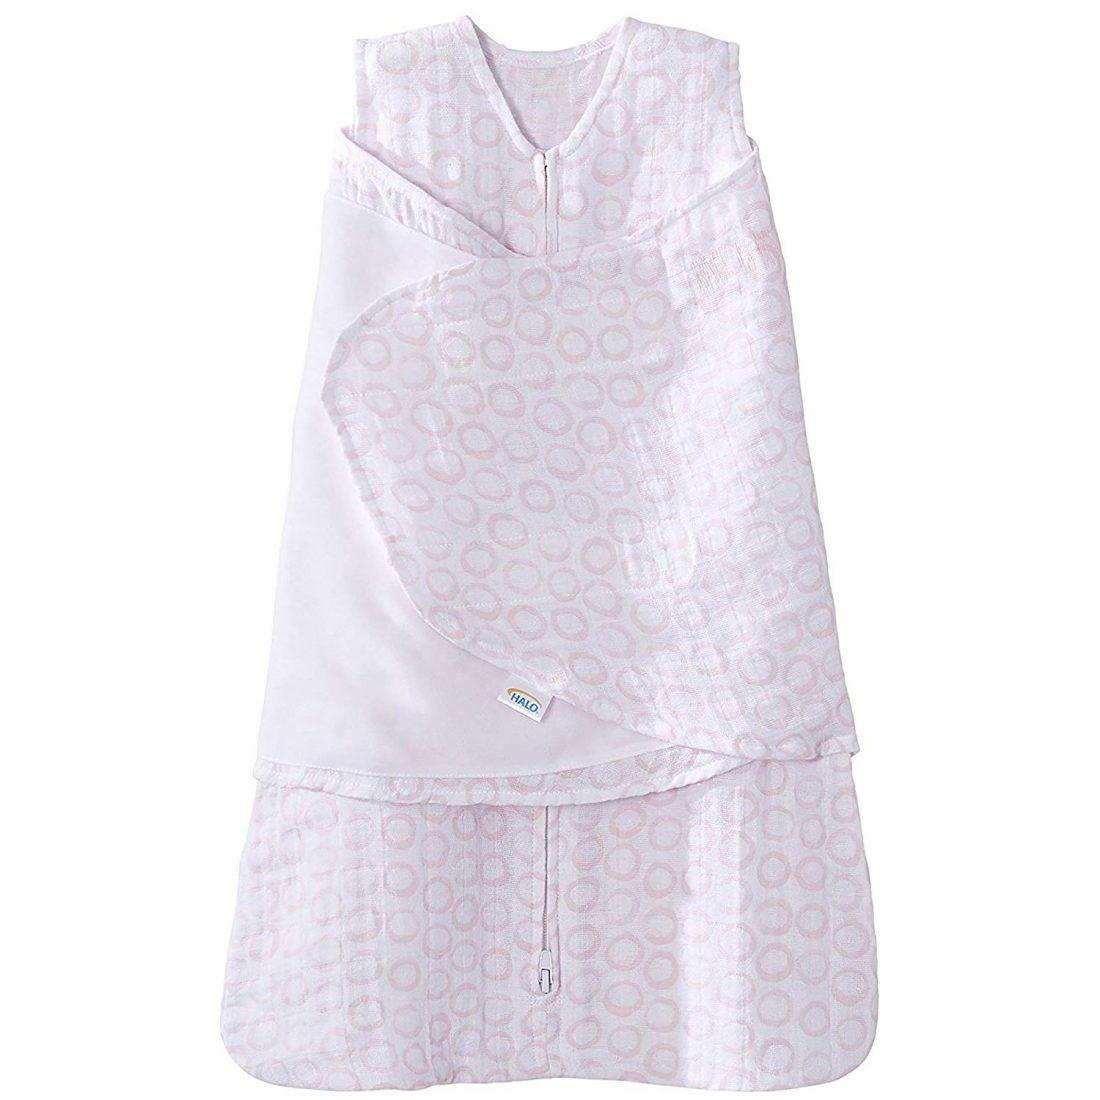 Newborn Halo 100/% Cotton Sleepsack Swaddle Wearable Blanket Aqua Sheep